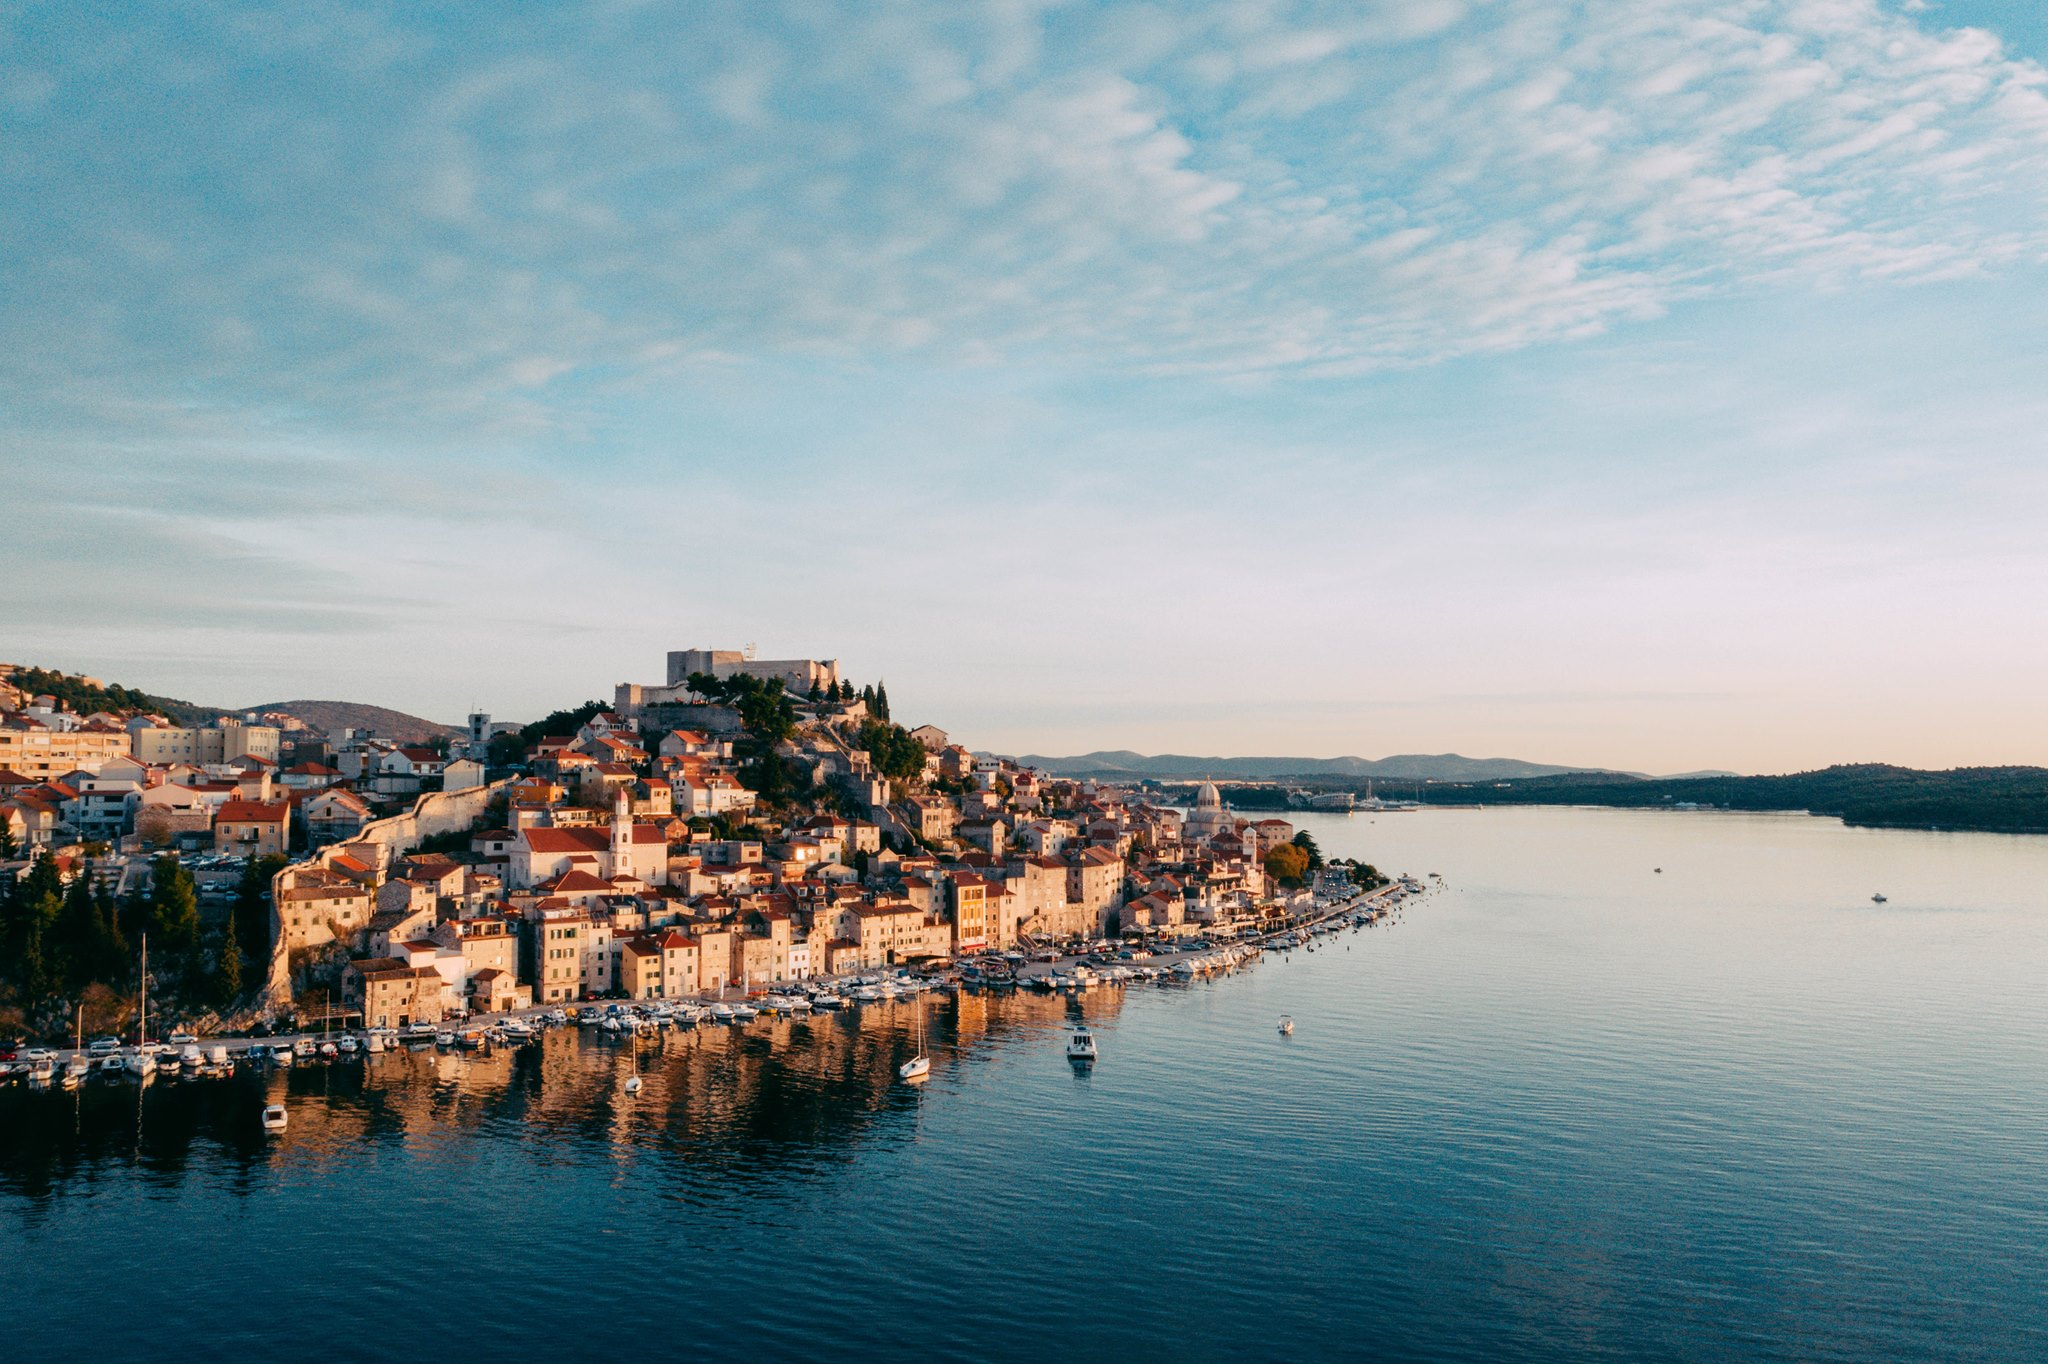 Top 10 Things to Do in Šibenik